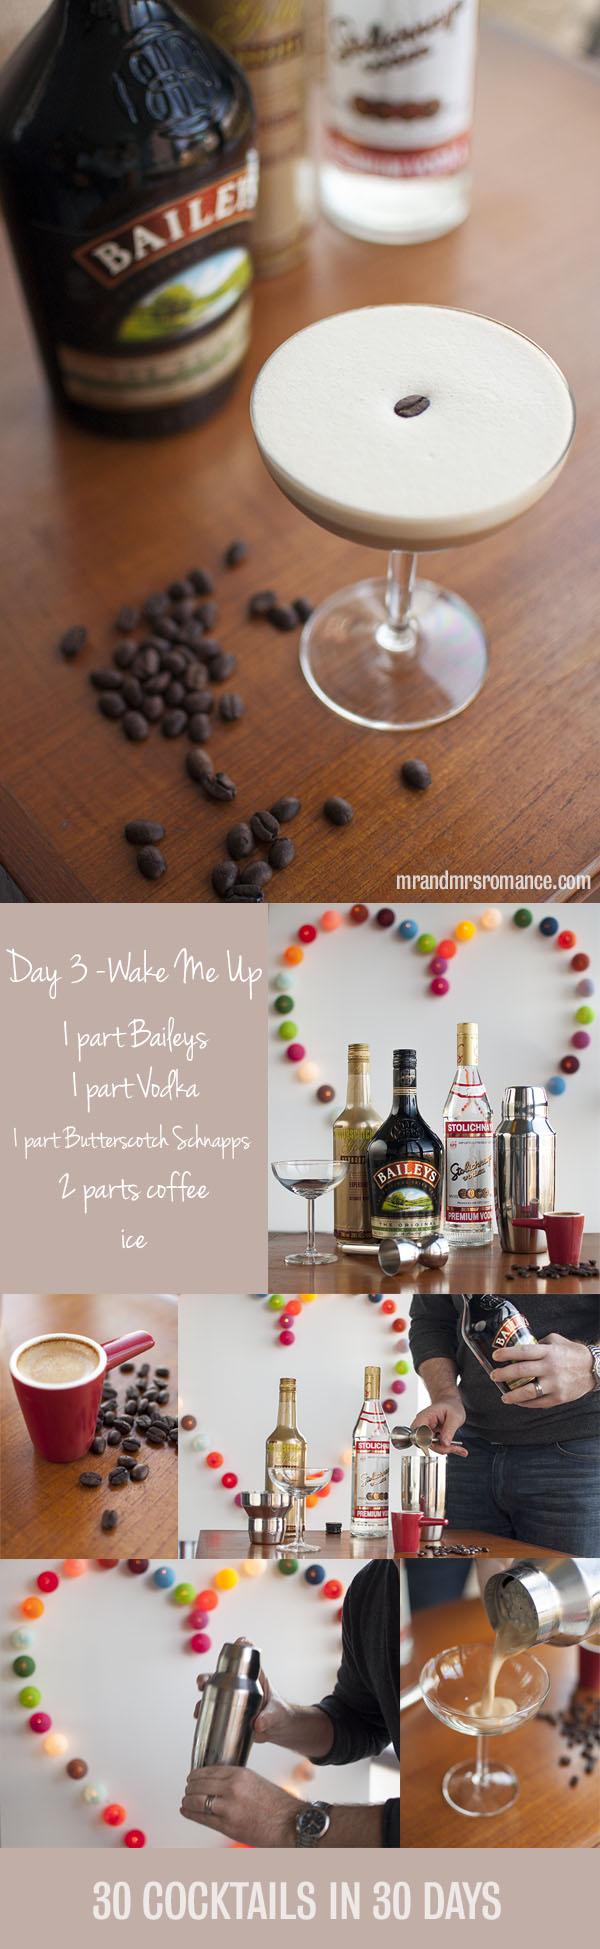 How to make an espresso cocktail